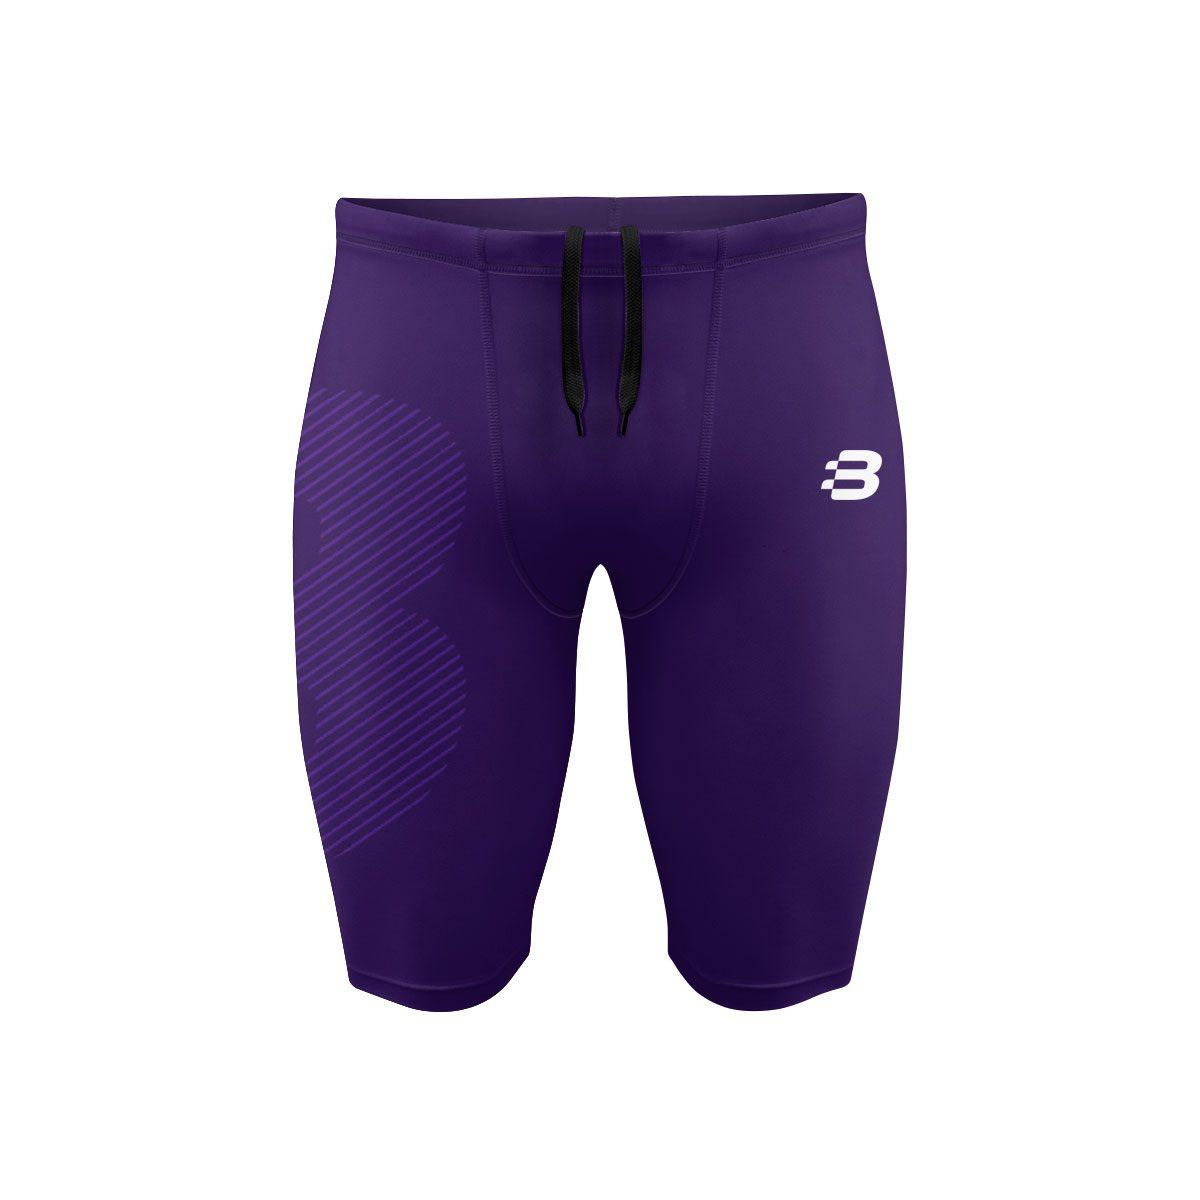 Mens Compression Shorts - Dark Purple